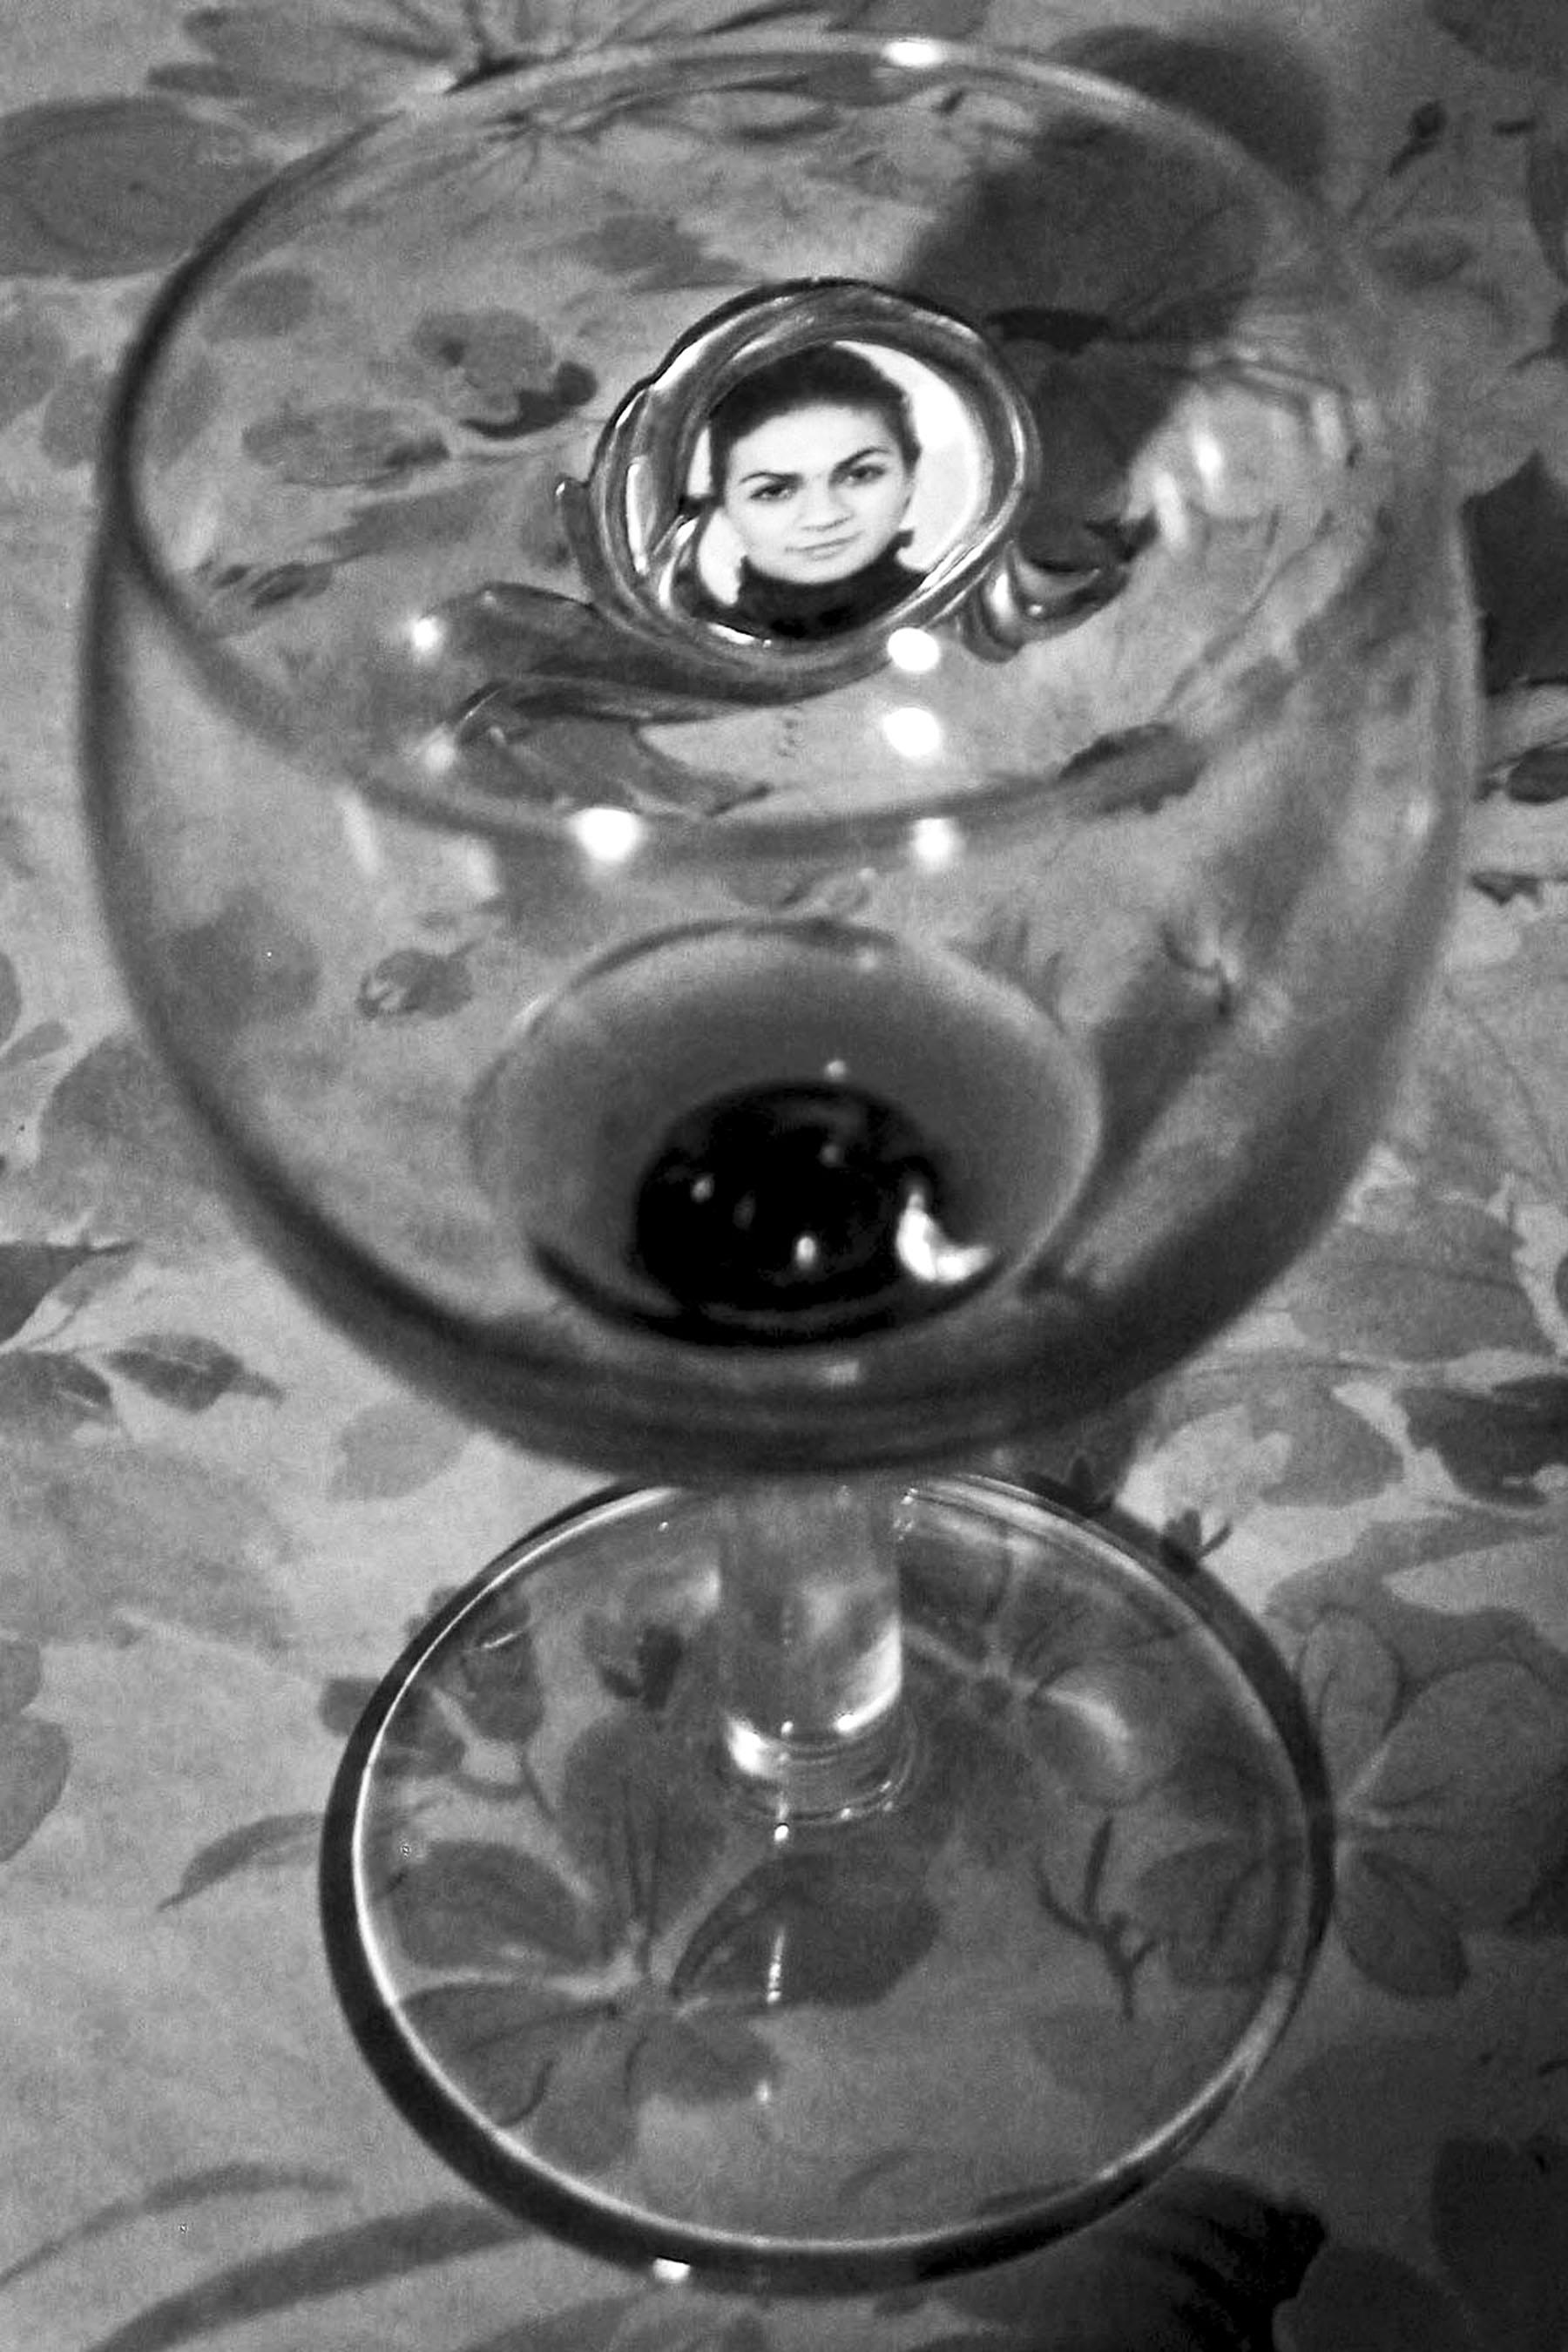 Missing_You_Paris_France.jpg